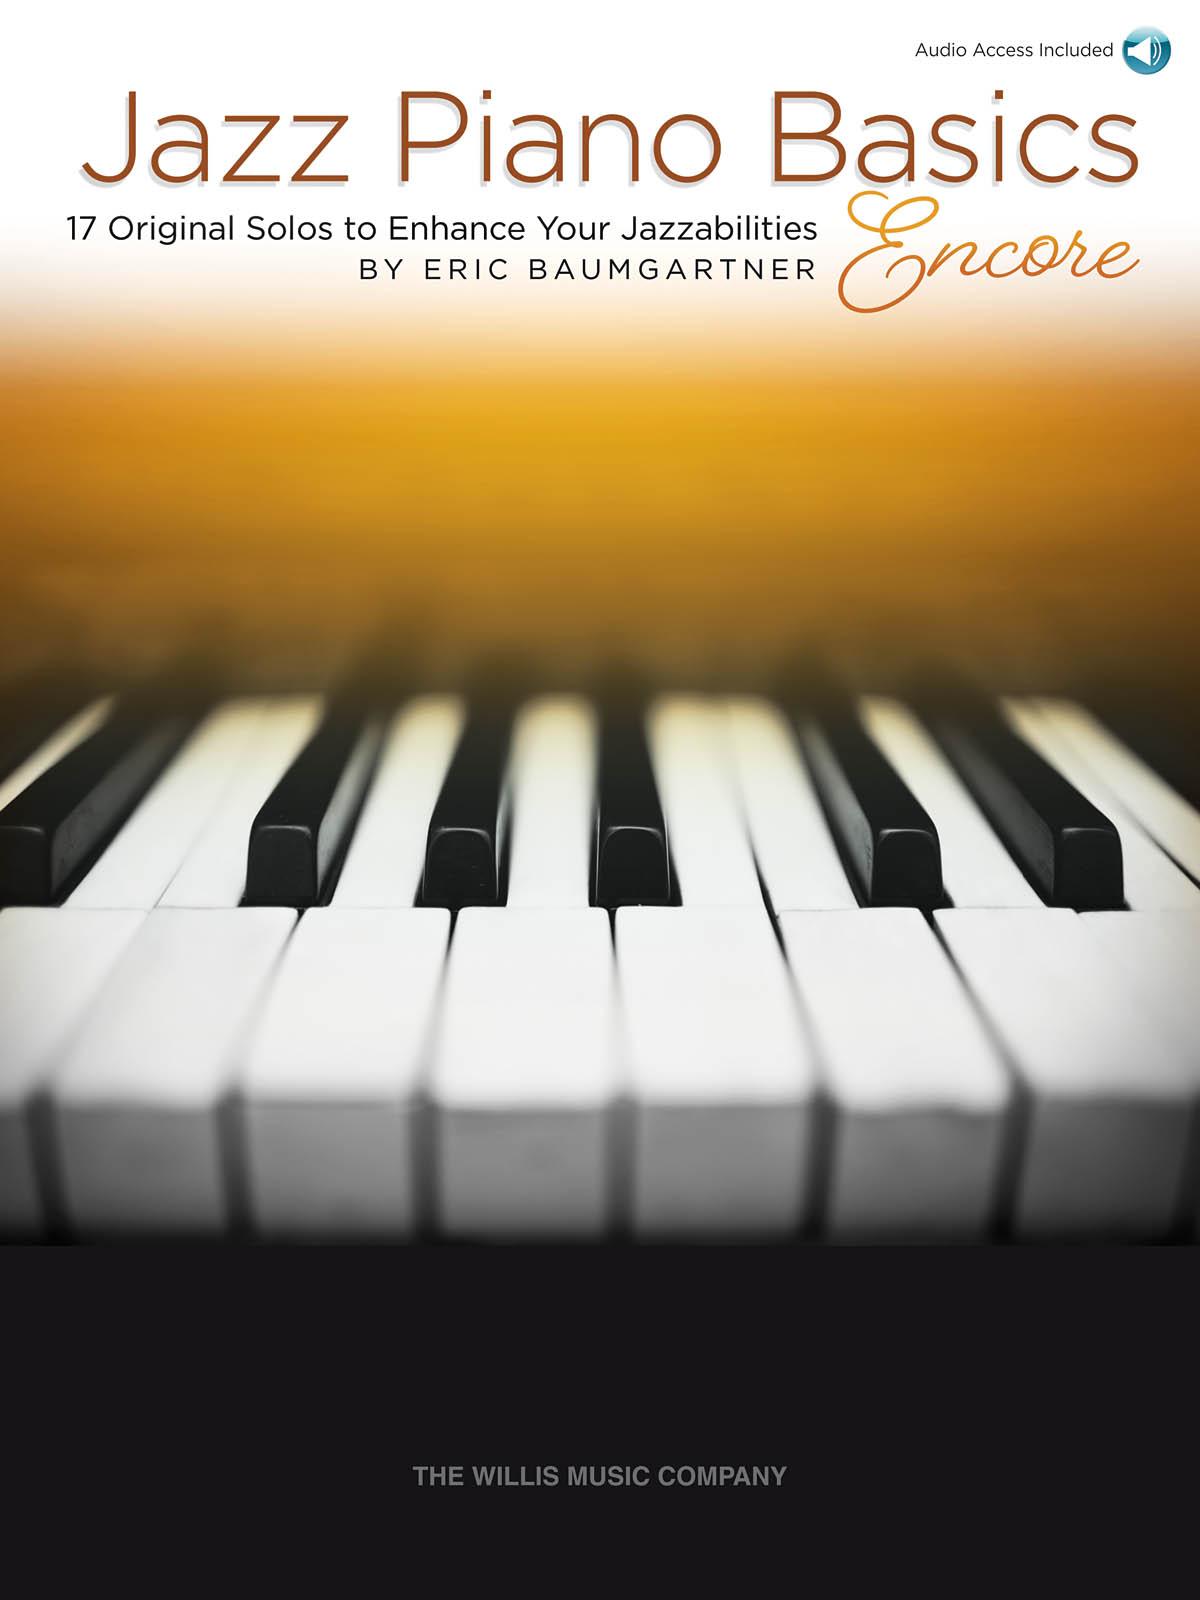 Eric Baumgartner: Jazz Piano Basics - Encore: Piano: Instrumental Album